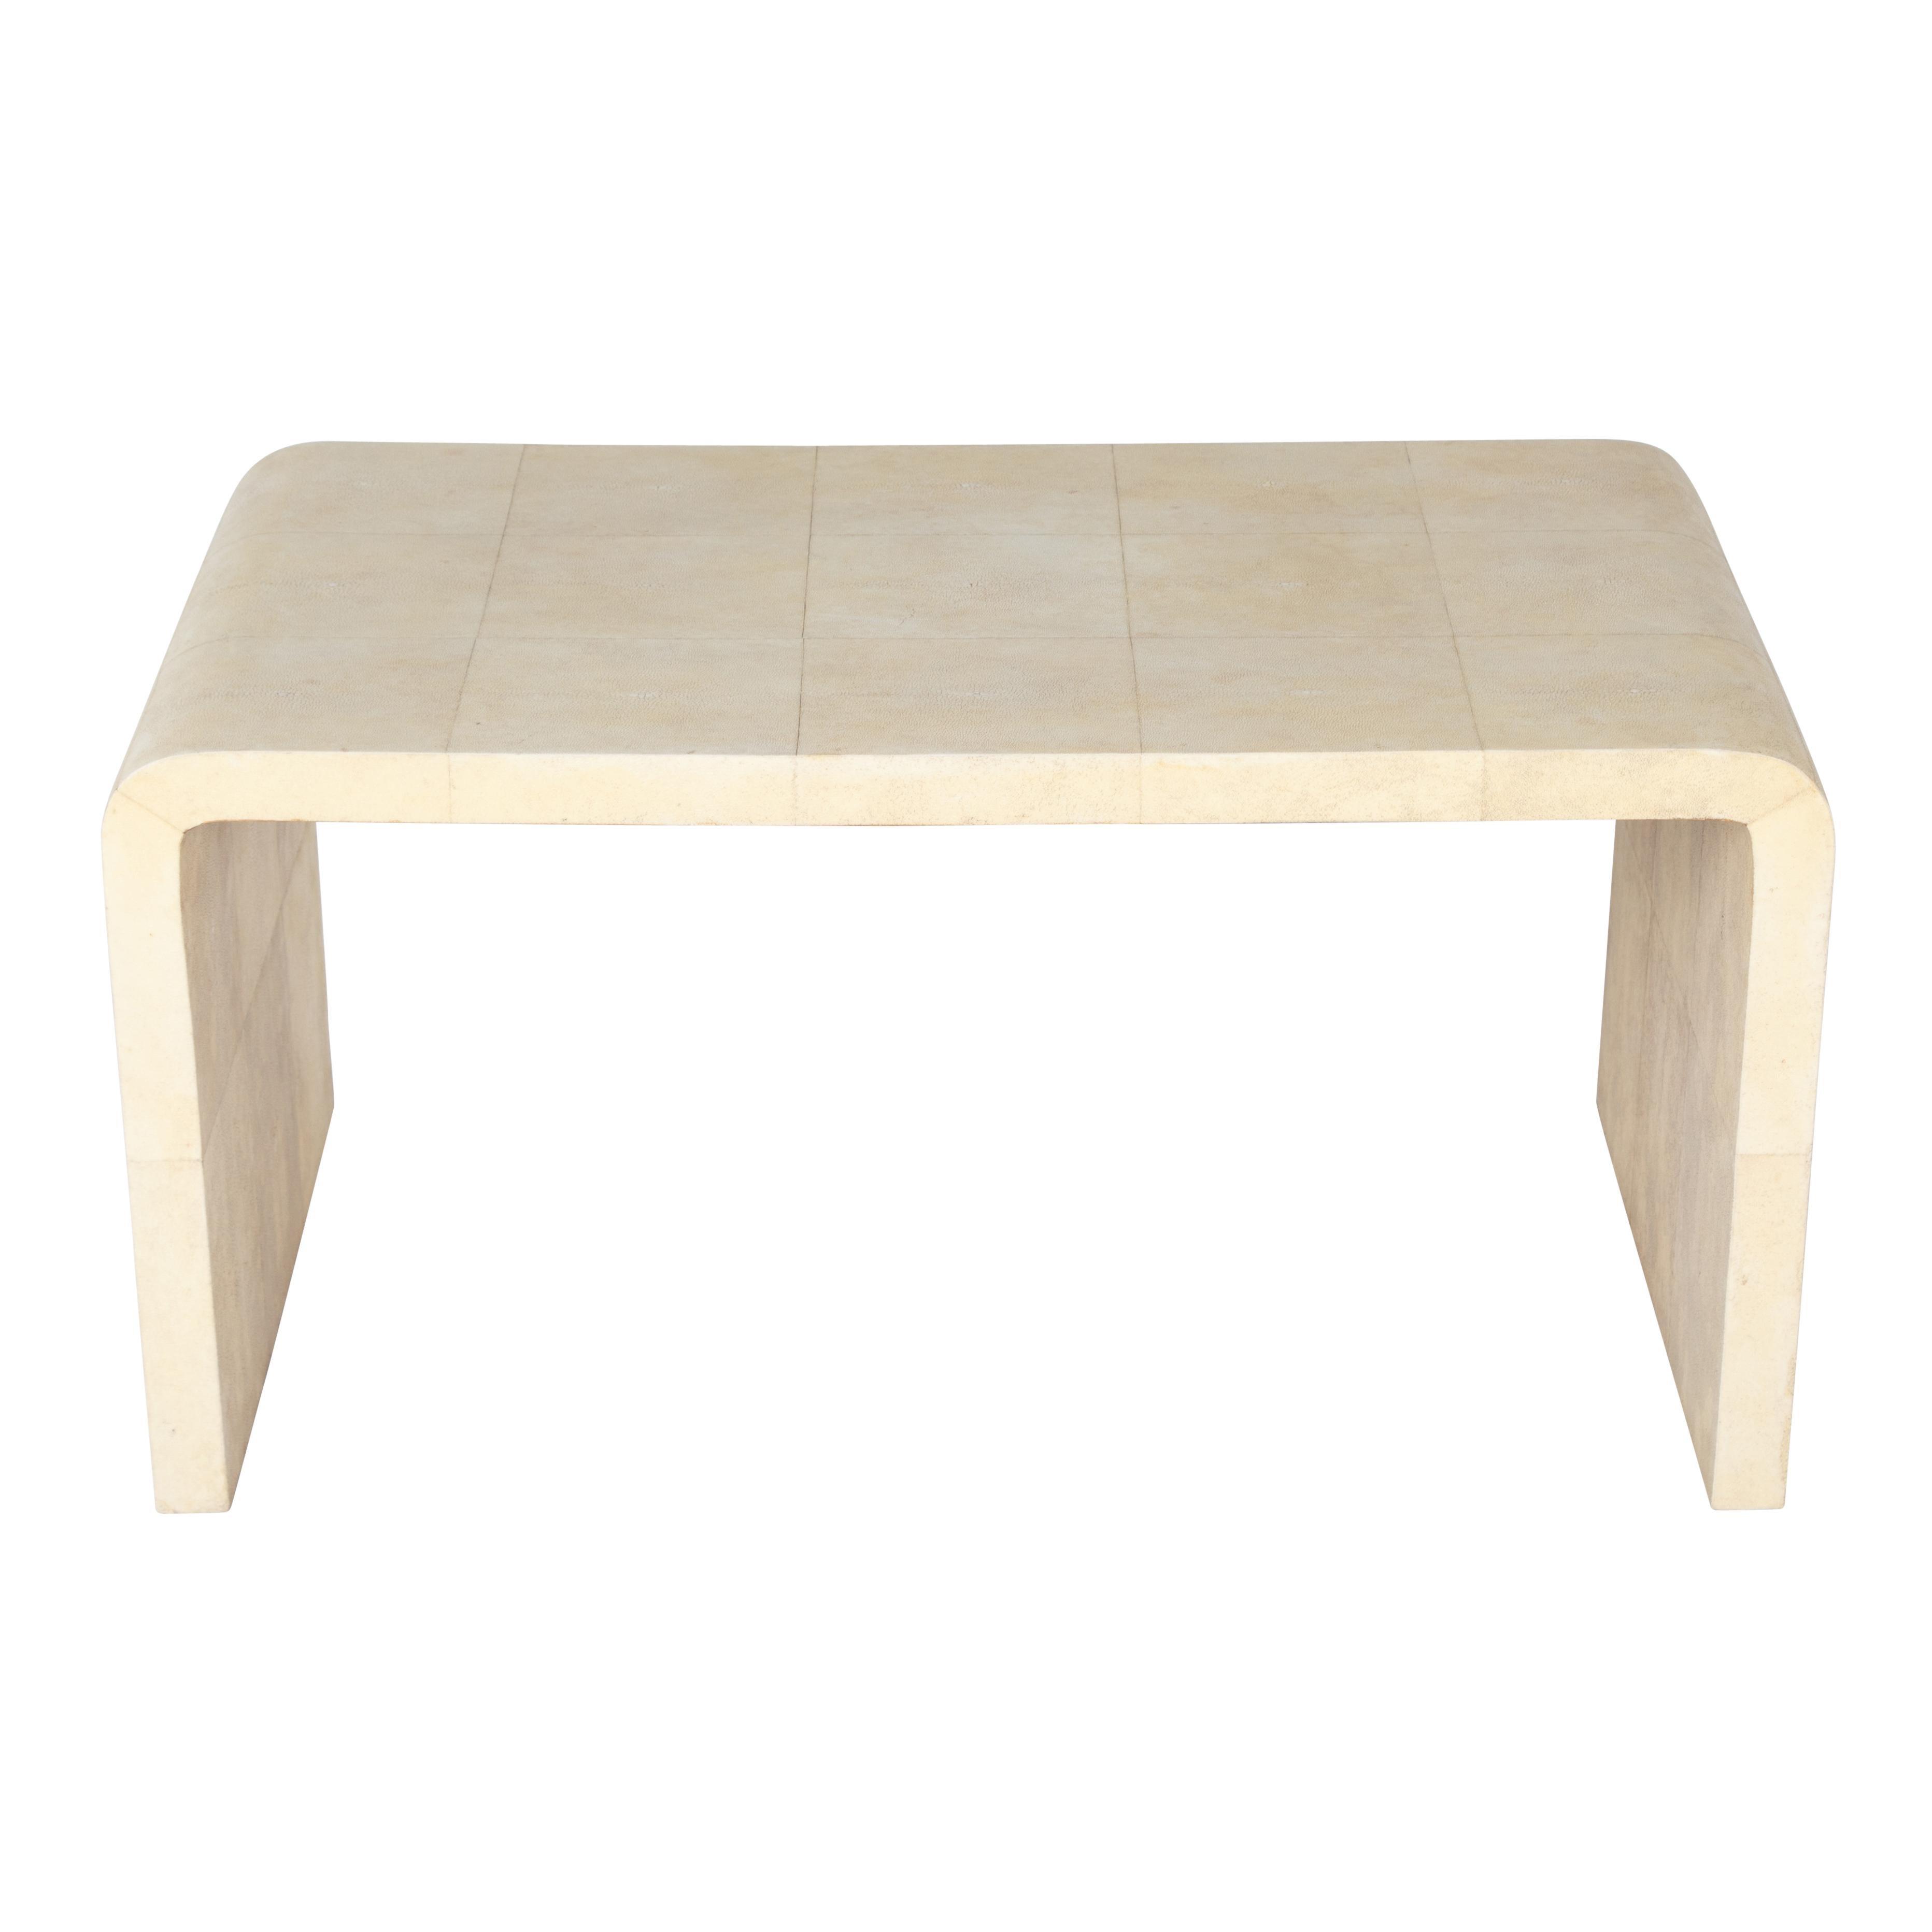 Shagreen furniture 434 for sale at 1stdibs